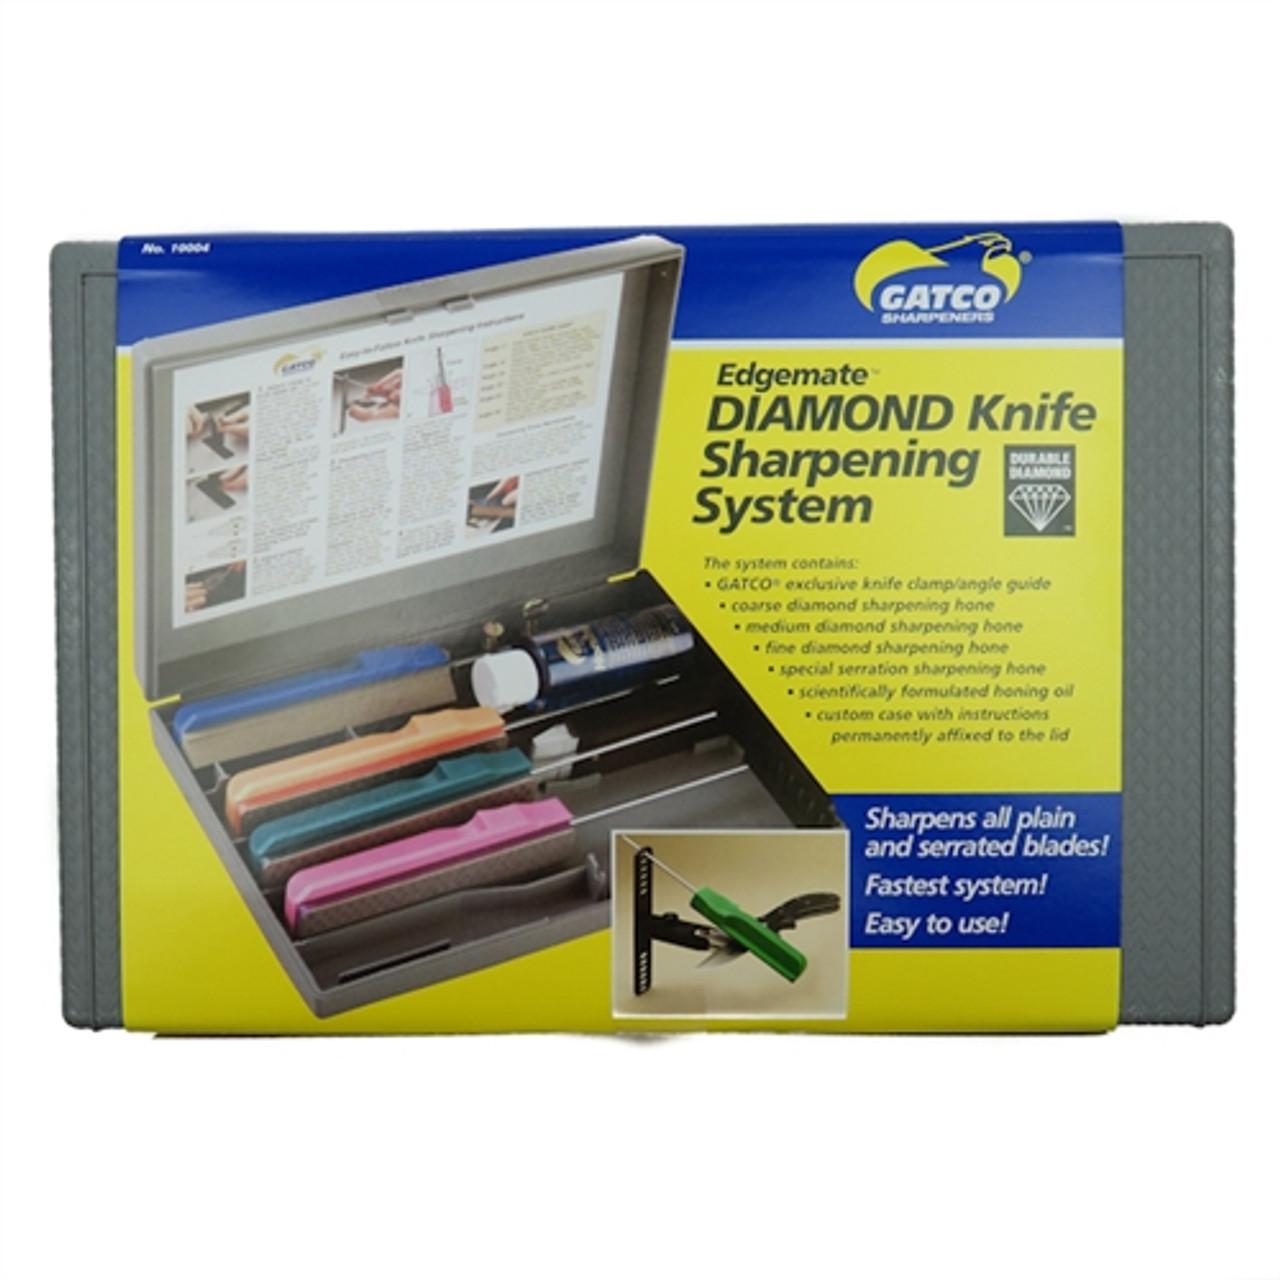 Gatco 10004 Edgemate Diamond Knife Sharpening System, 4 Hones